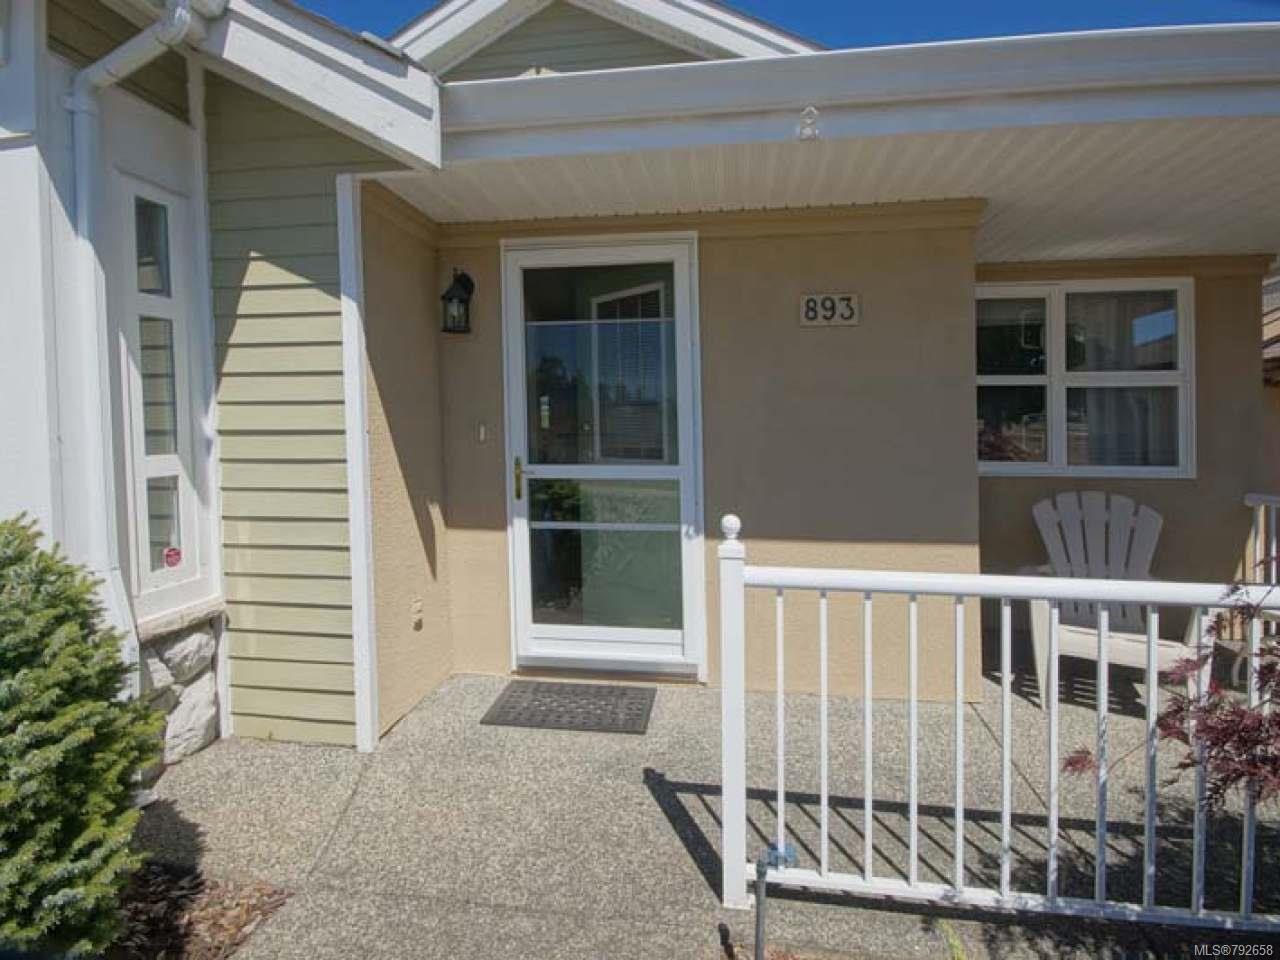 Photo 10: Photos: 893 EDGEWARE Avenue in PARKSVILLE: PQ Parksville House for sale (Parksville/Qualicum)  : MLS®# 792658